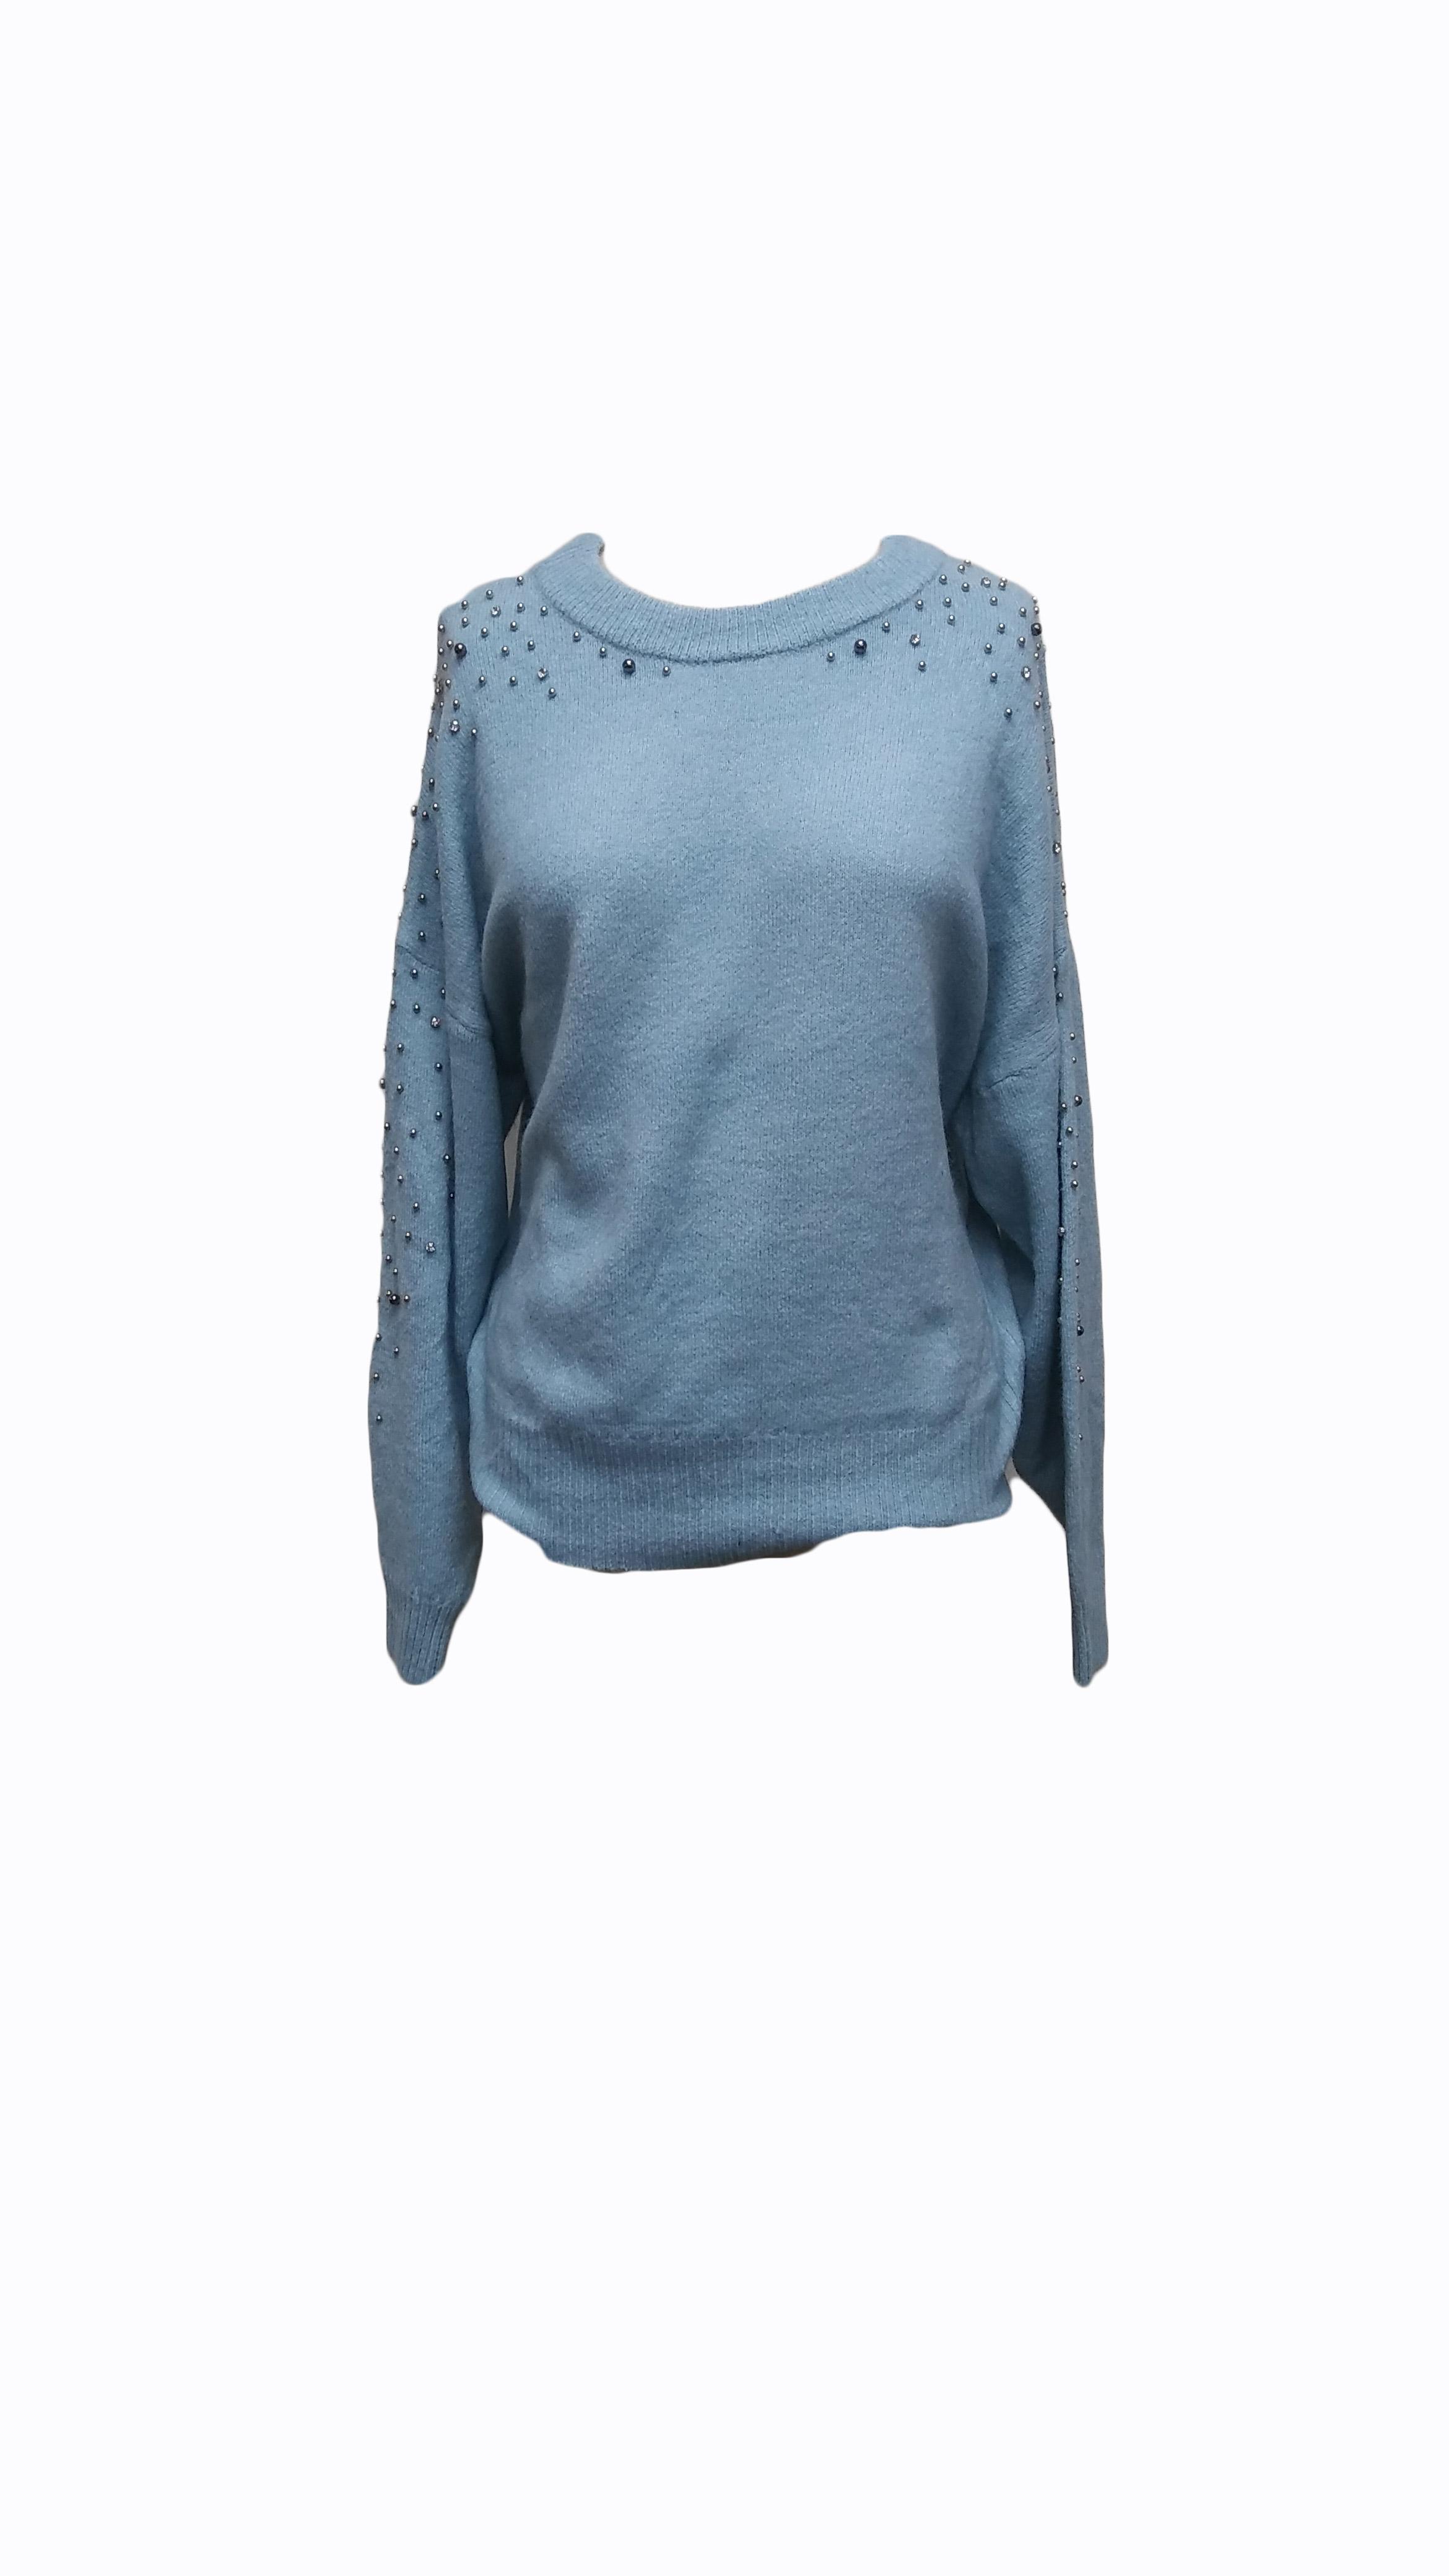 Sofi Studs Top -Blue - Front